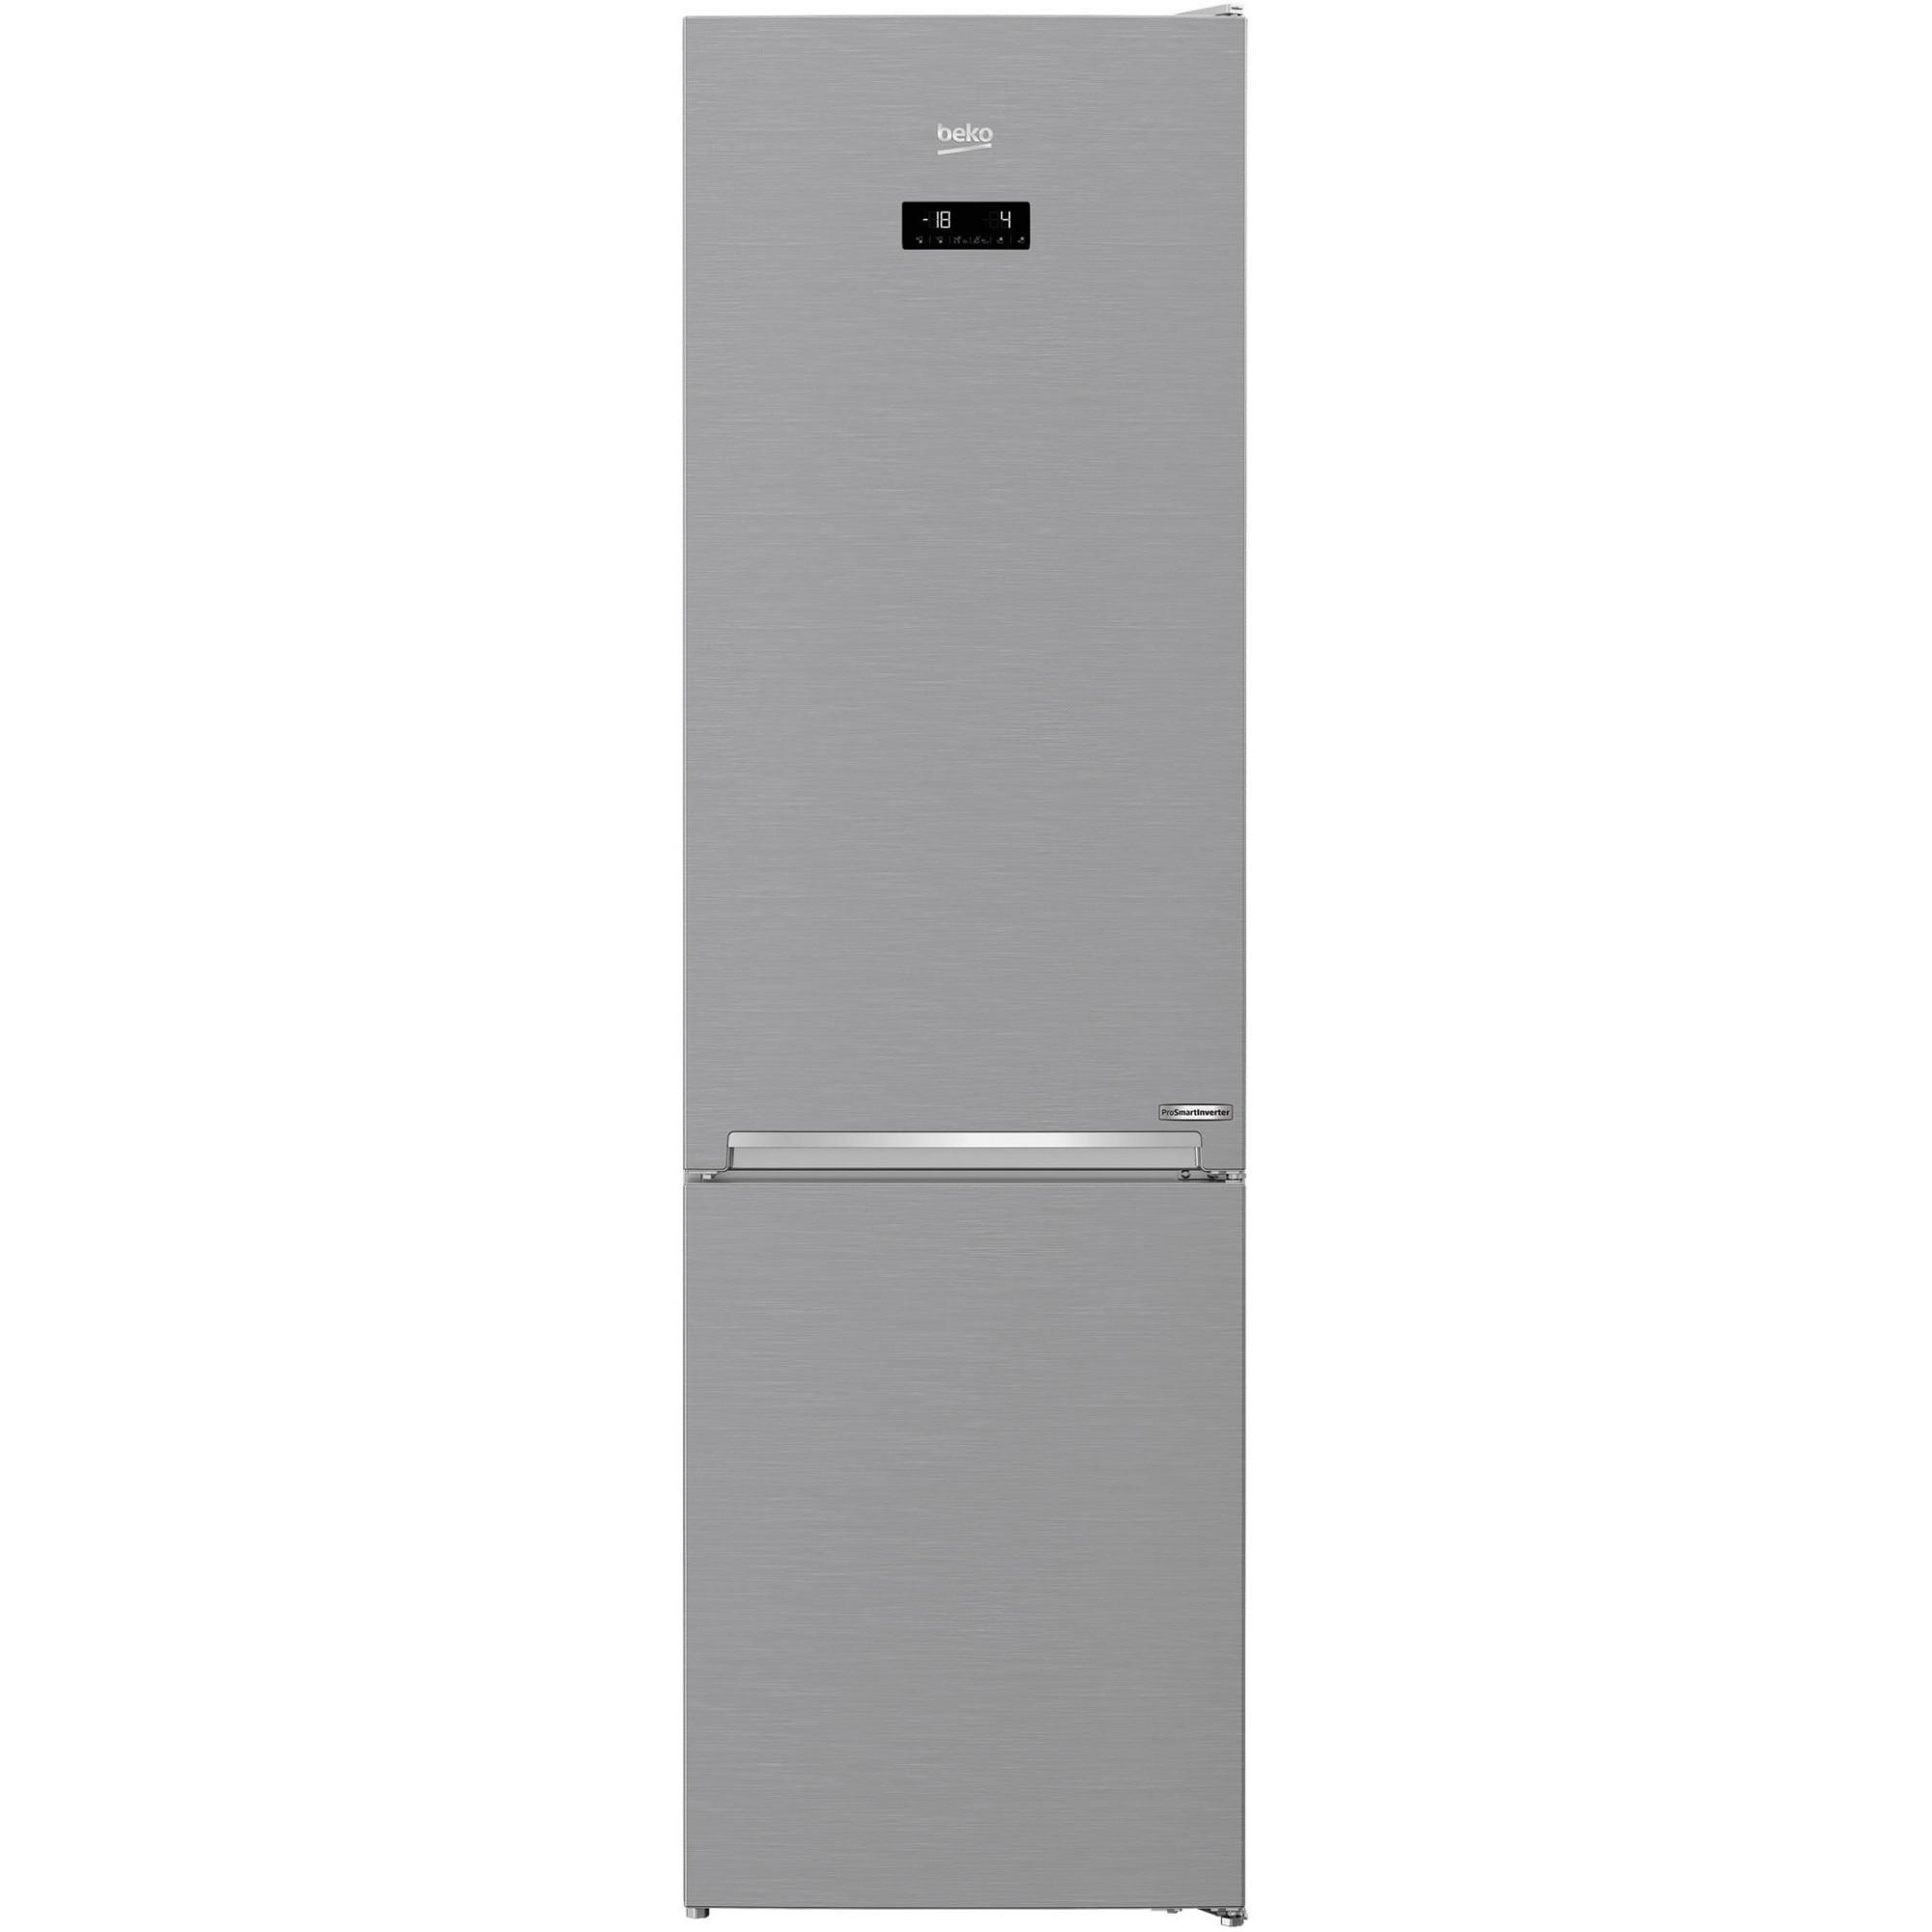 Fotografie Combina frigorifica Beko Neofrost Dual Cooling RCNA406E60XBN, 362 l, NeoFrost, Display touch control, Raft sticle, Clasa C, H 203 cm, Argintiu